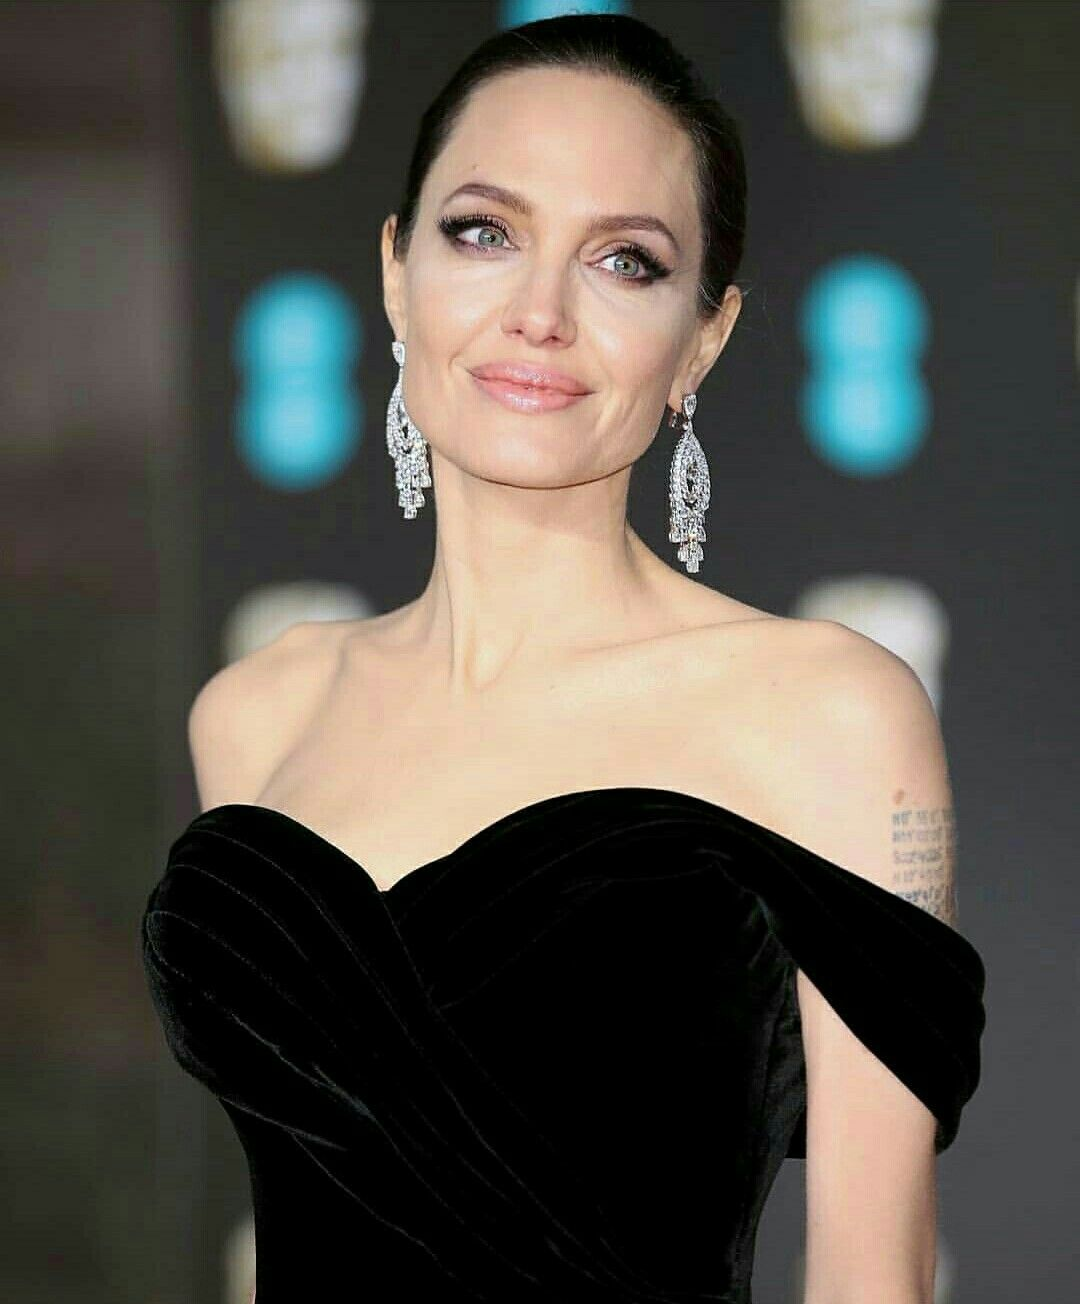 Angelina Jolie at the BAFTA Awards 2018 red carpet